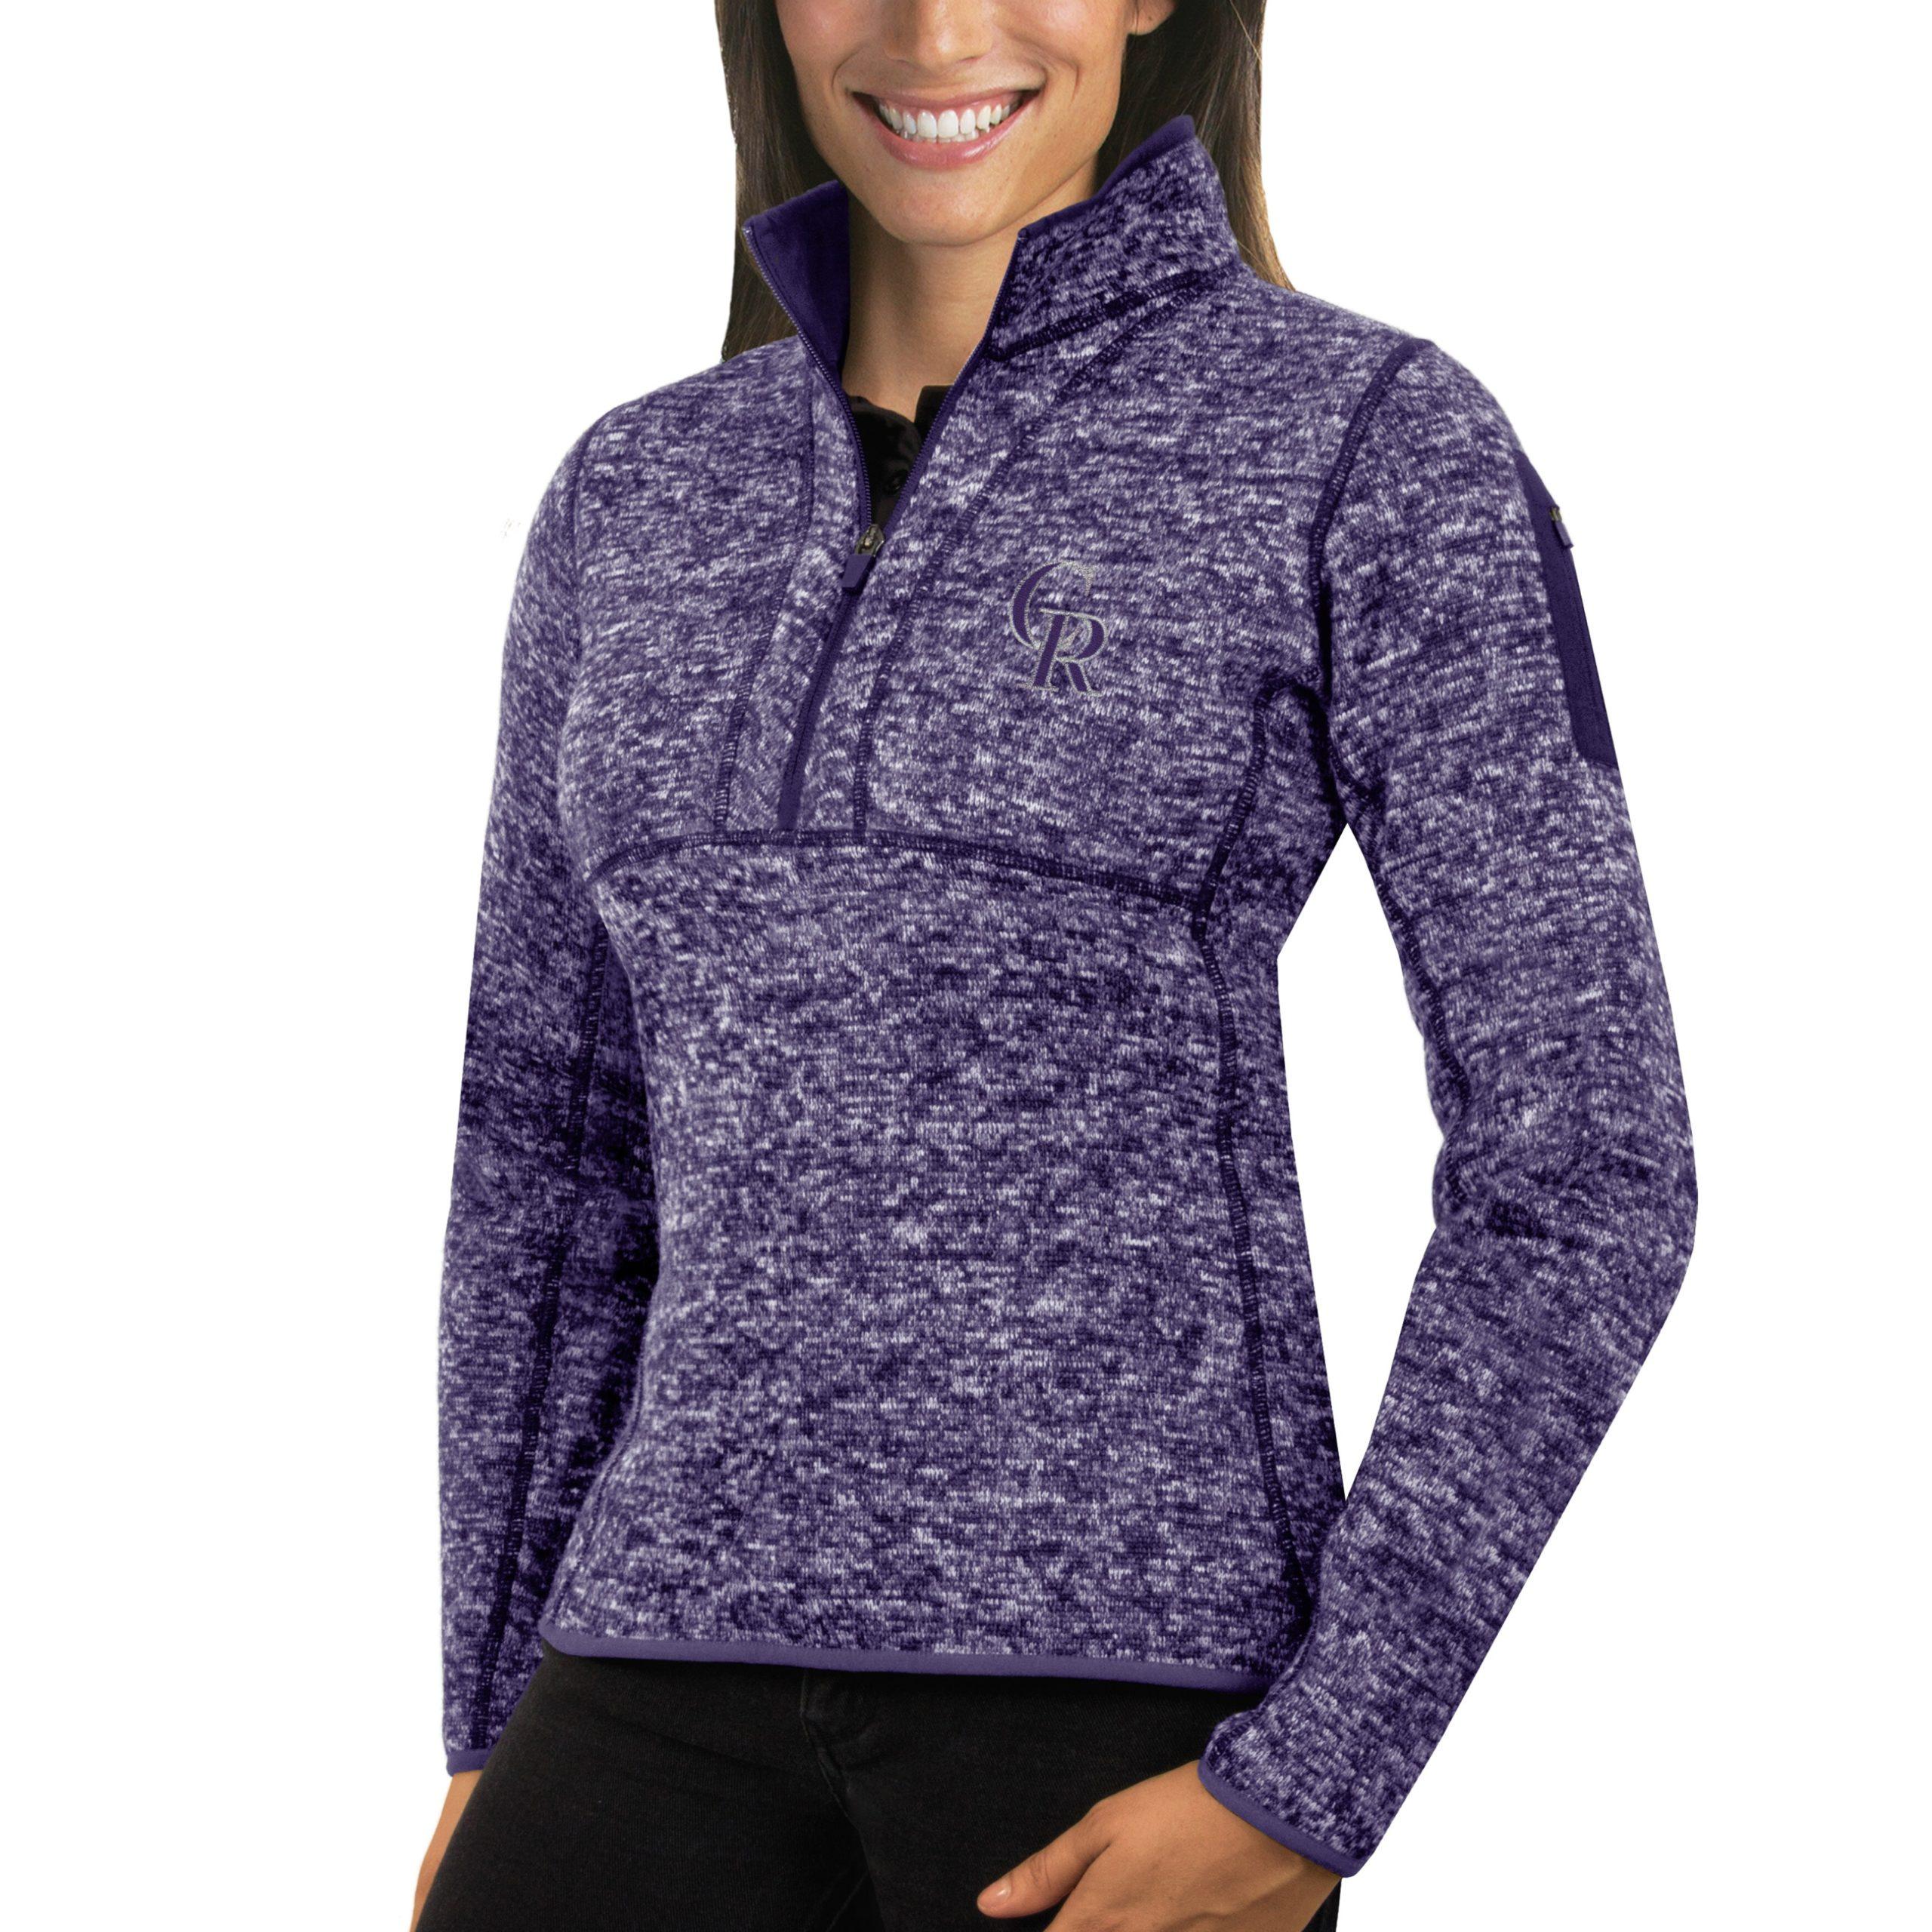 Colorado Rockies Antigua Women's Fortune Half-Zip Pullover Sweater - Heathered Purple